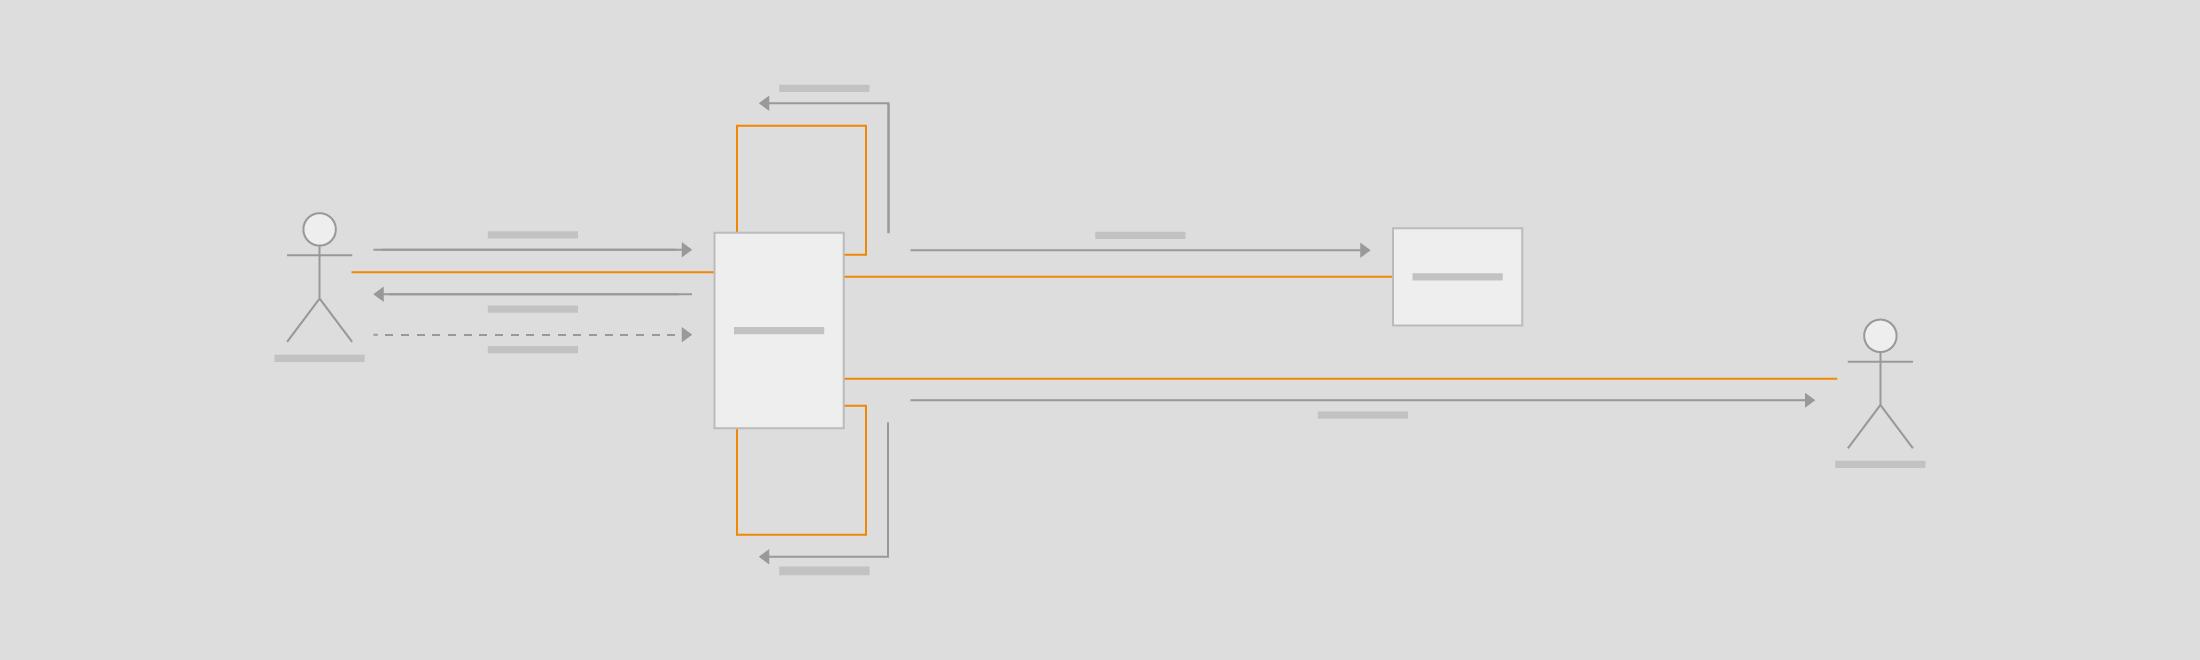 Uml Communication Diagrams Draw Io